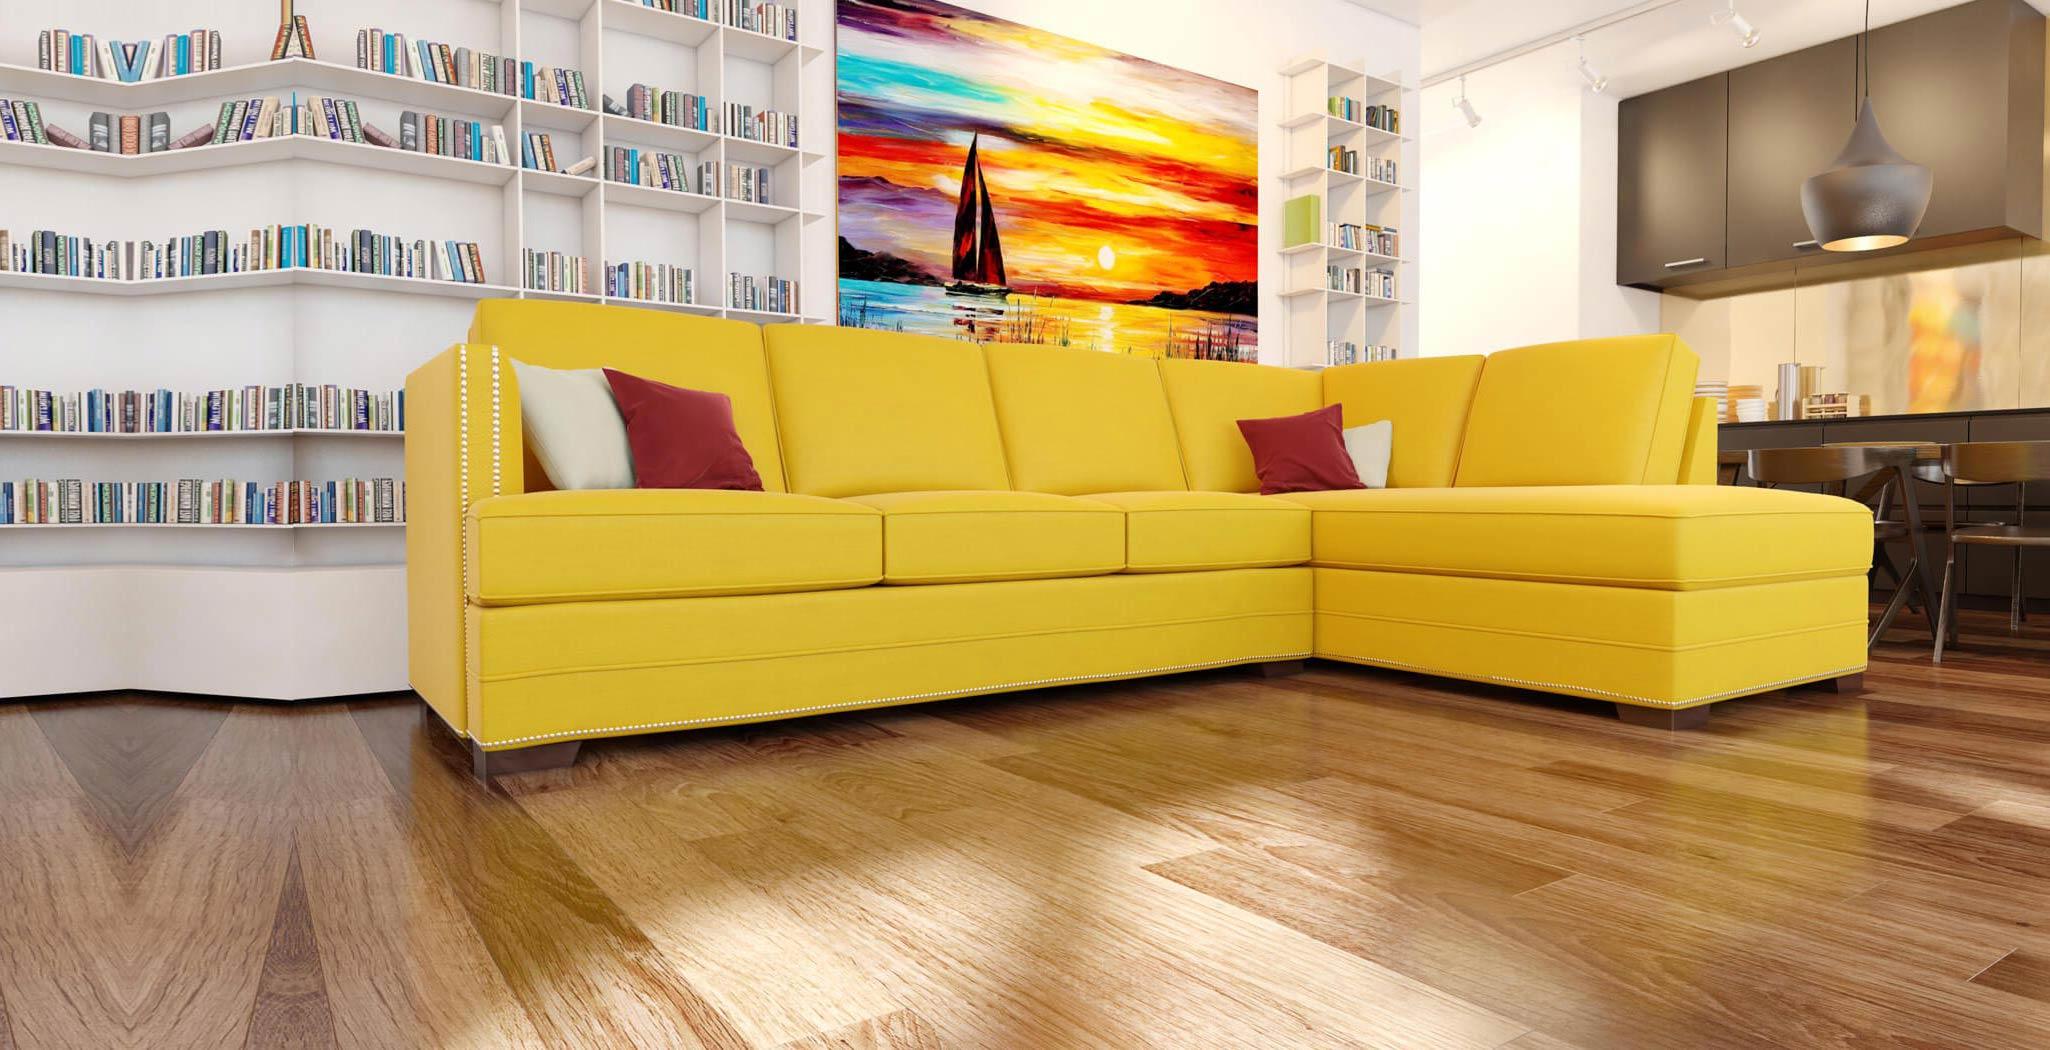 riga panel furniture gallery 5